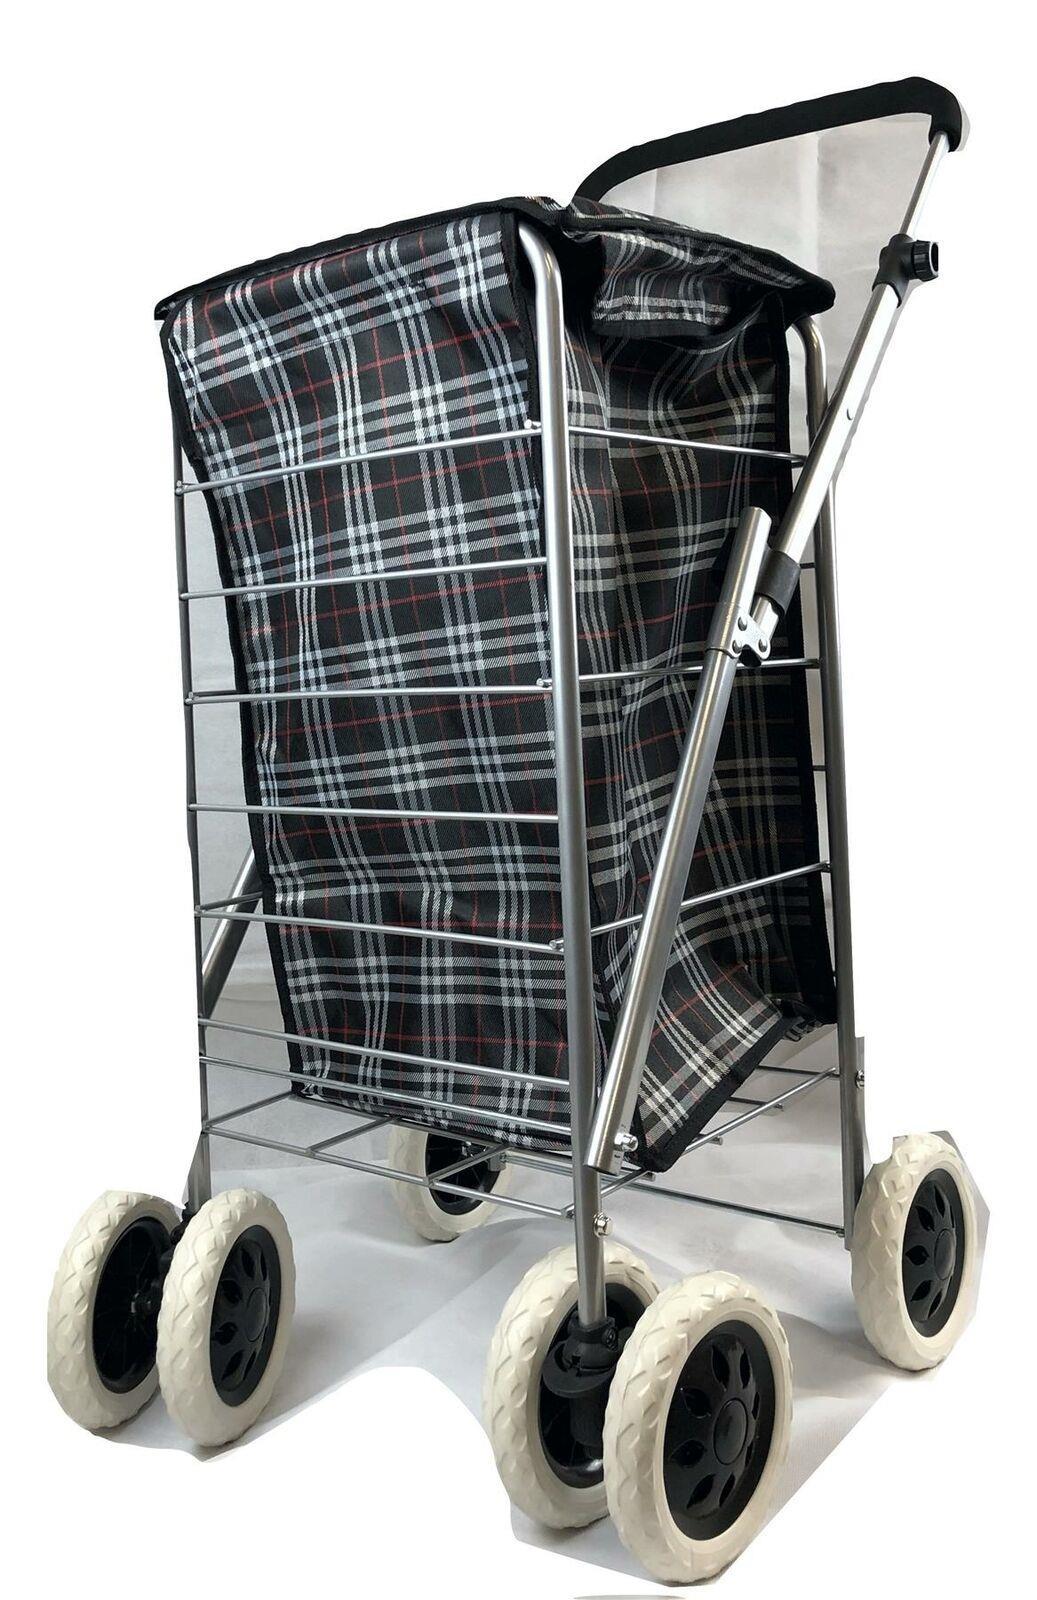 Léger Pliable 4 ou 6 roues stockage Shopping Trolley Amovible Sac